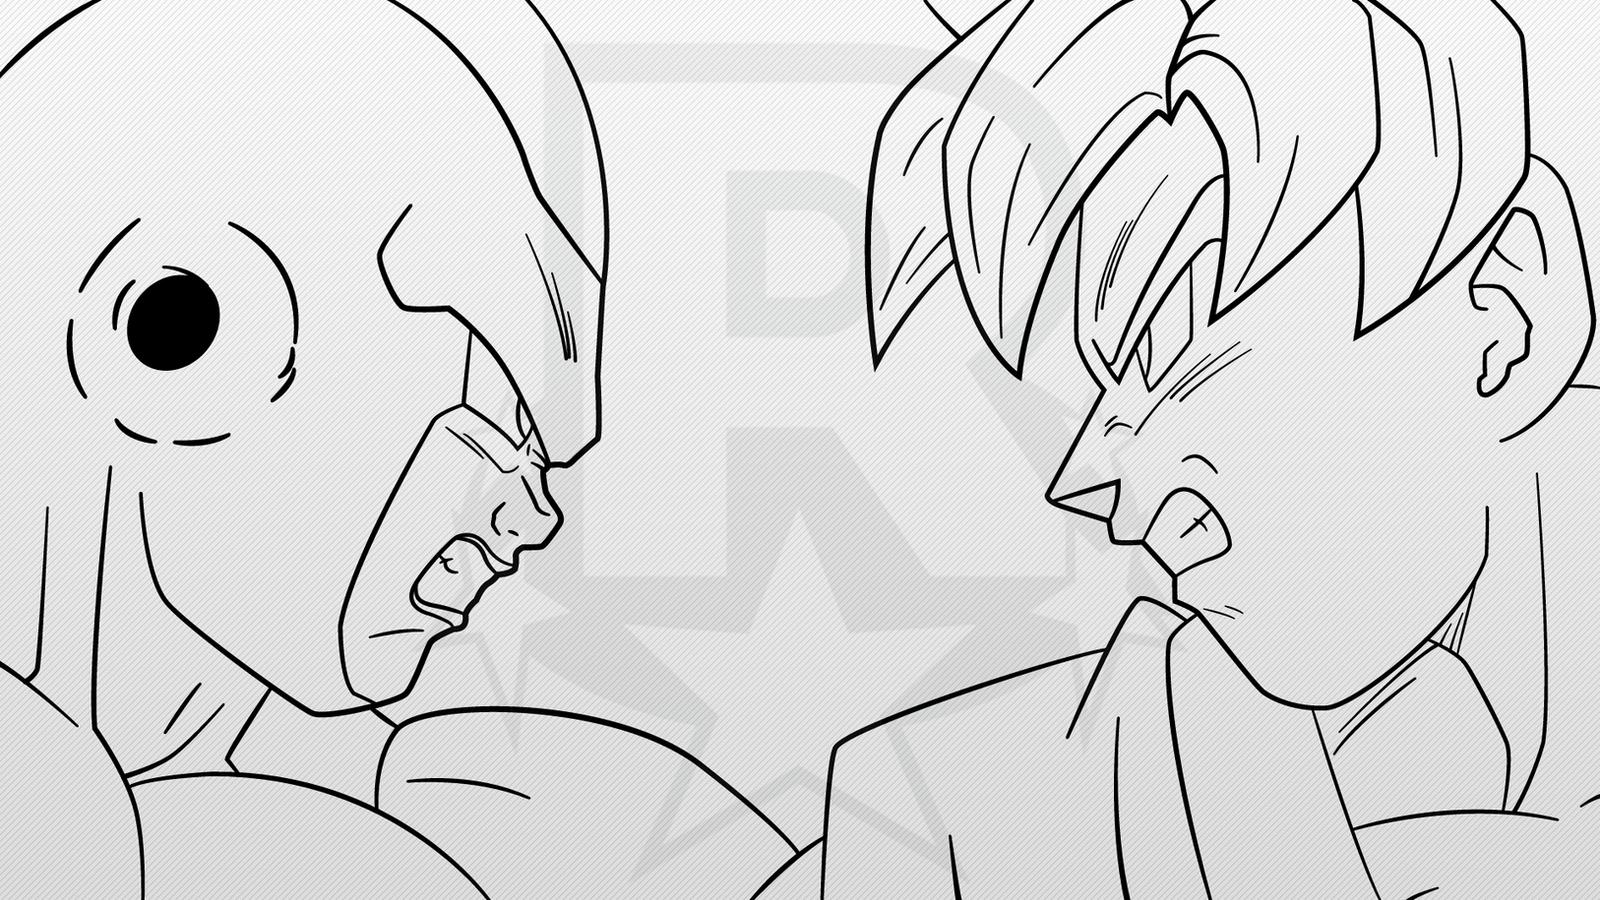 Line Art Vs No Line Art : Super saiyan blue goku vs golden frieza line art by